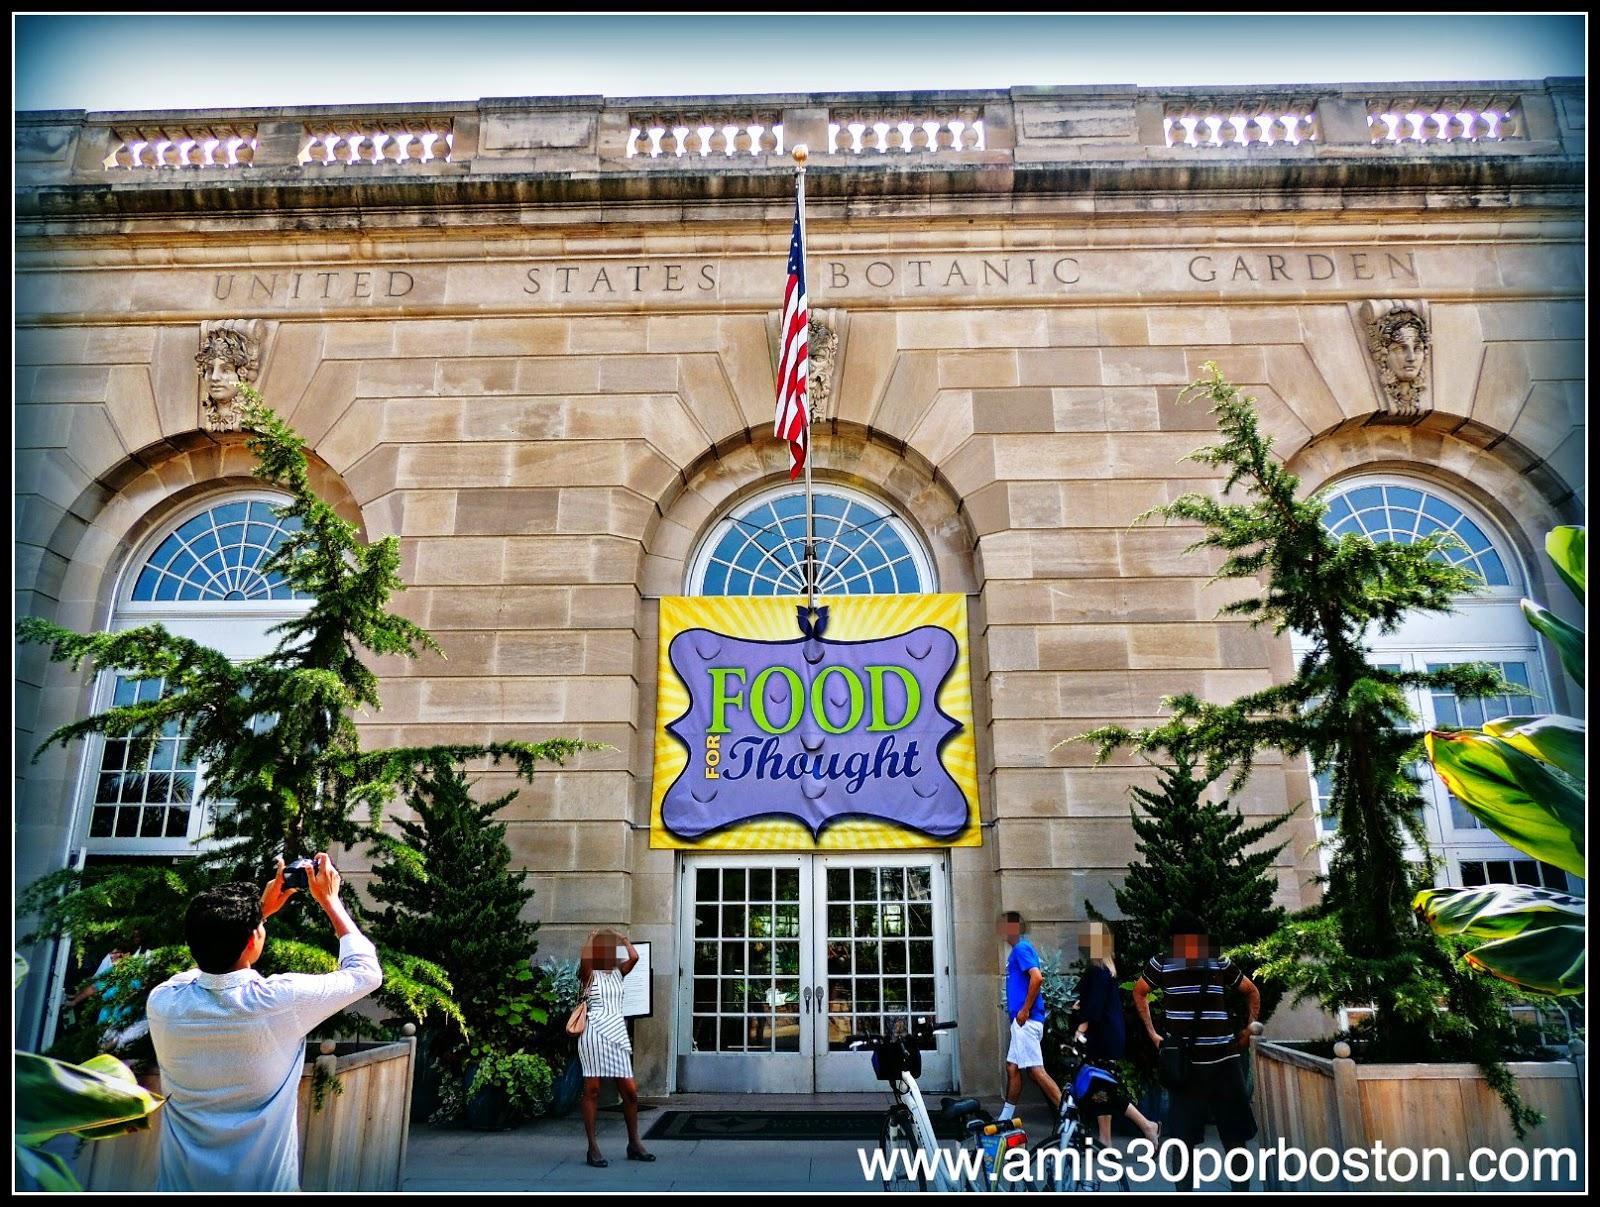 United States Botanic Garden & The National Garden en el National Mall de Washington D.C.